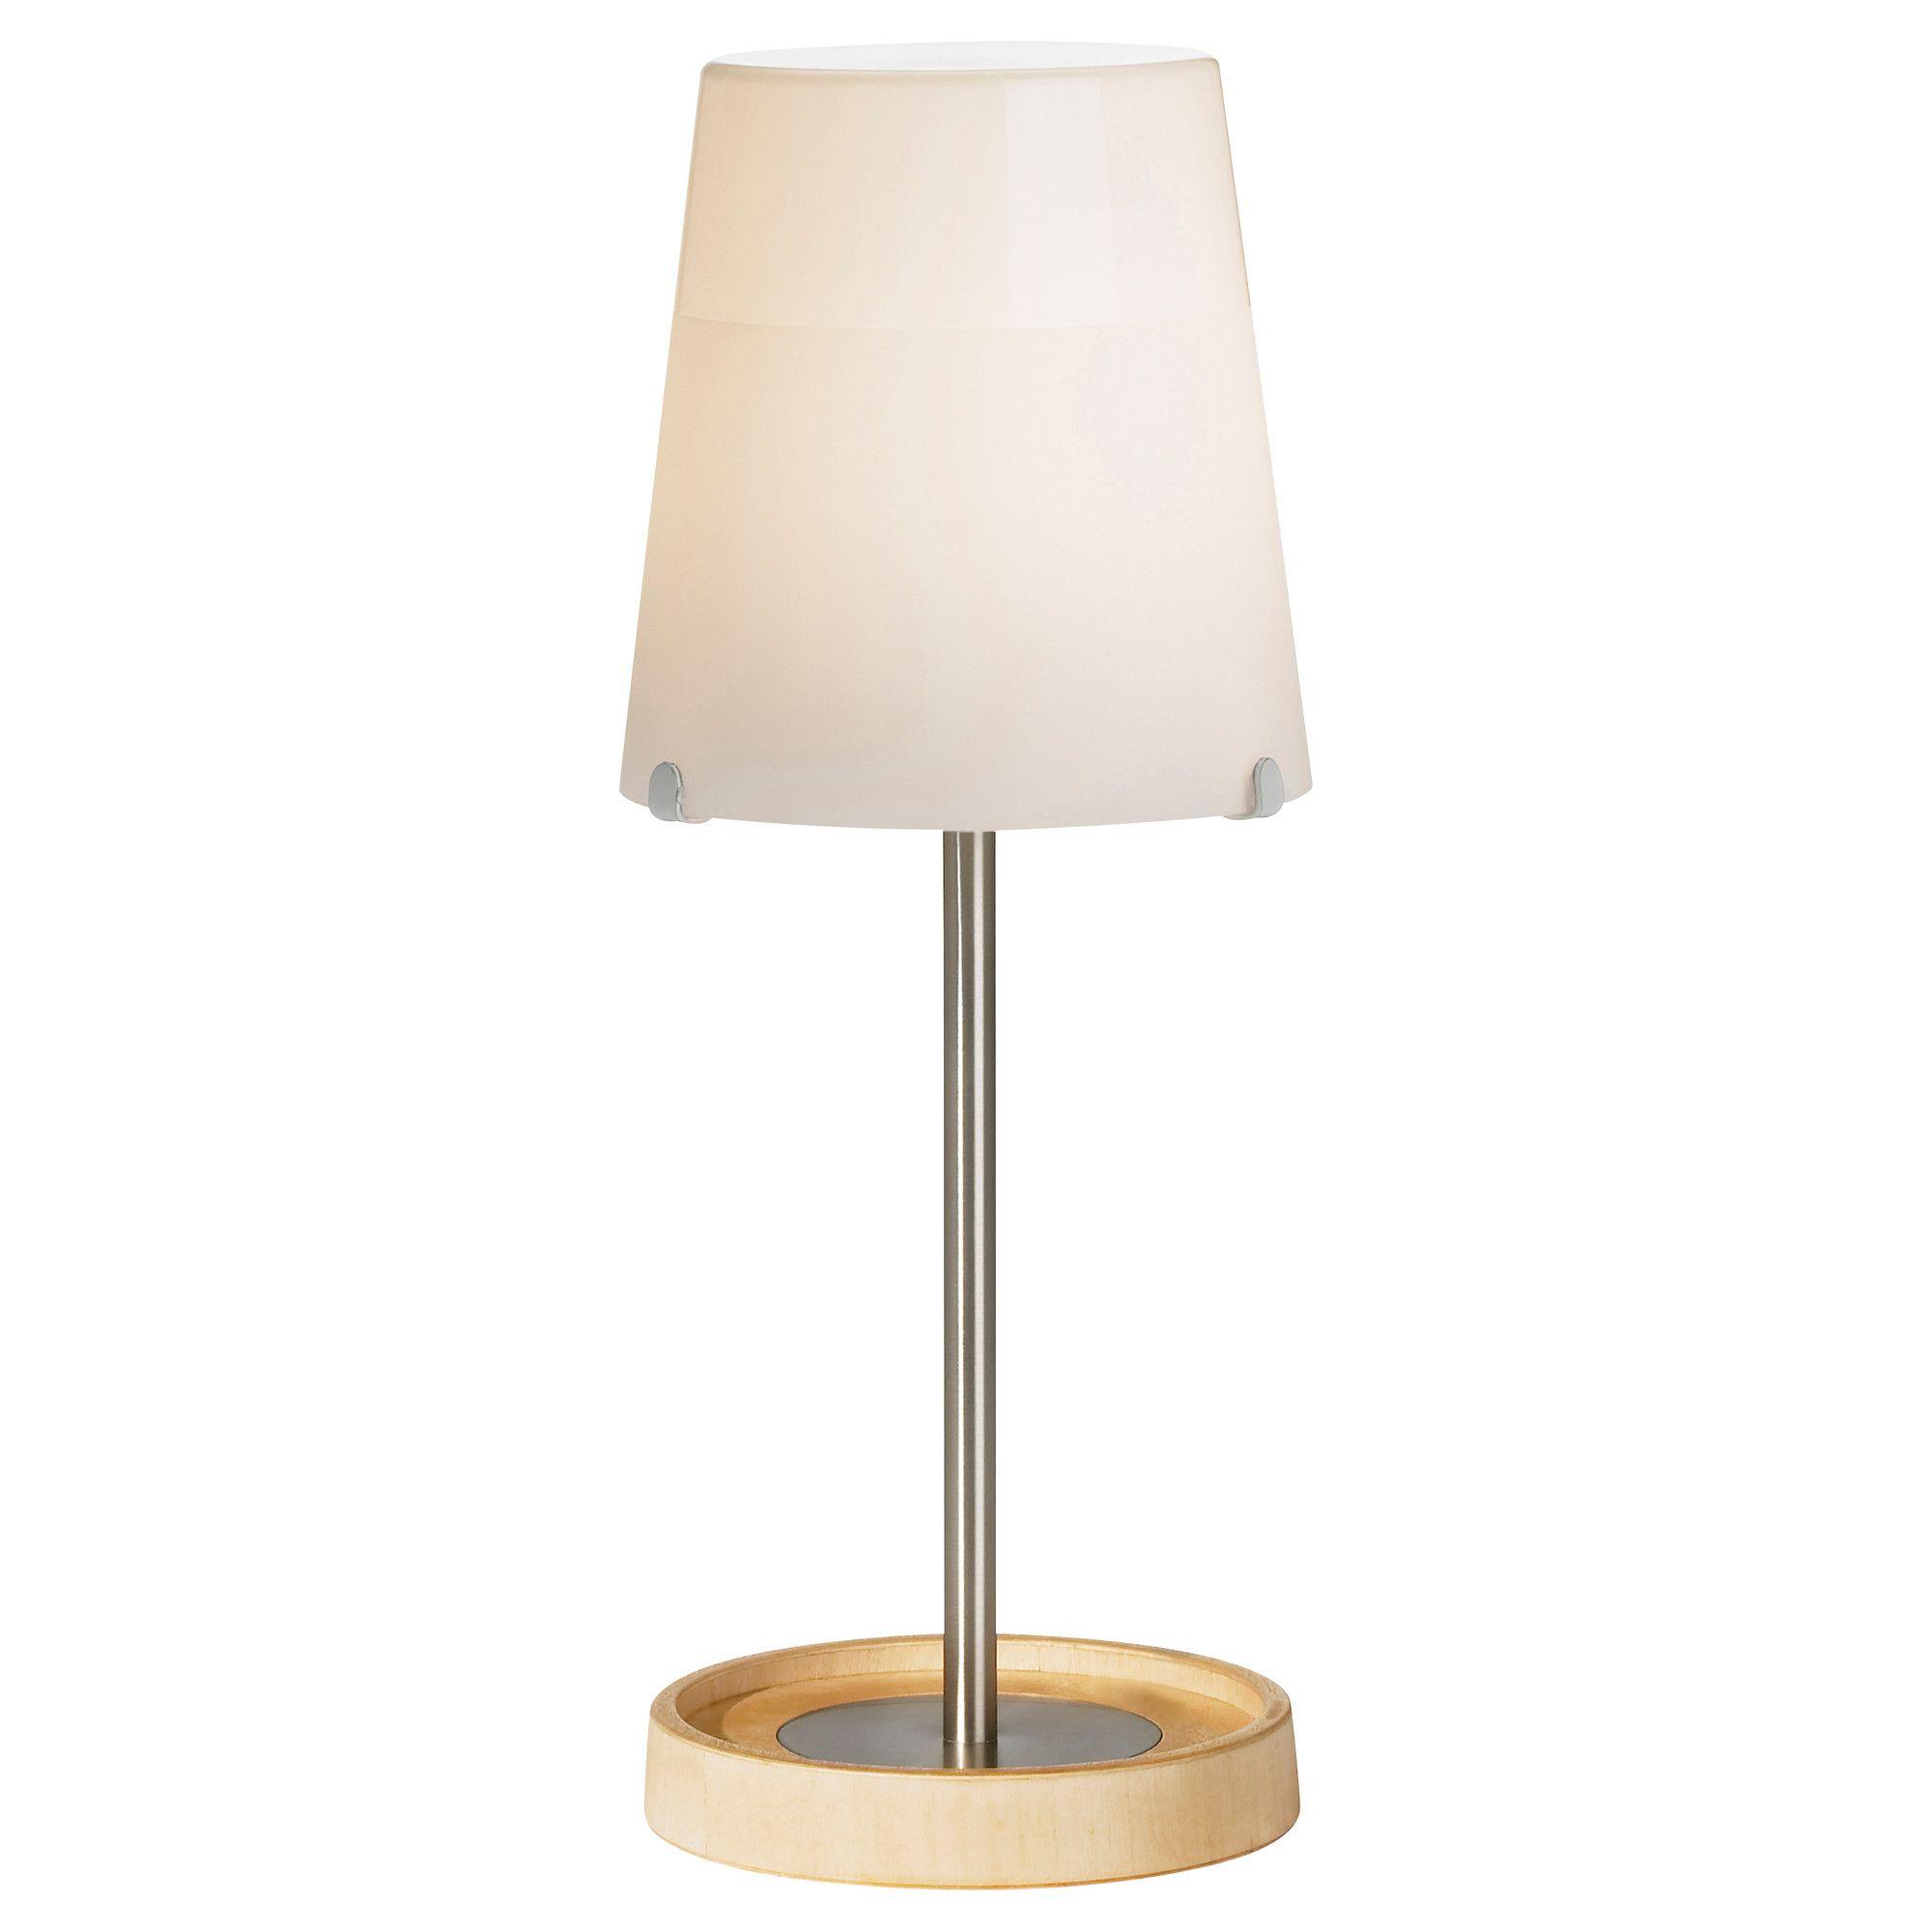 Basisk lampada da tavolo ikea ikea pinterest - Lampada tavolo ikea ...